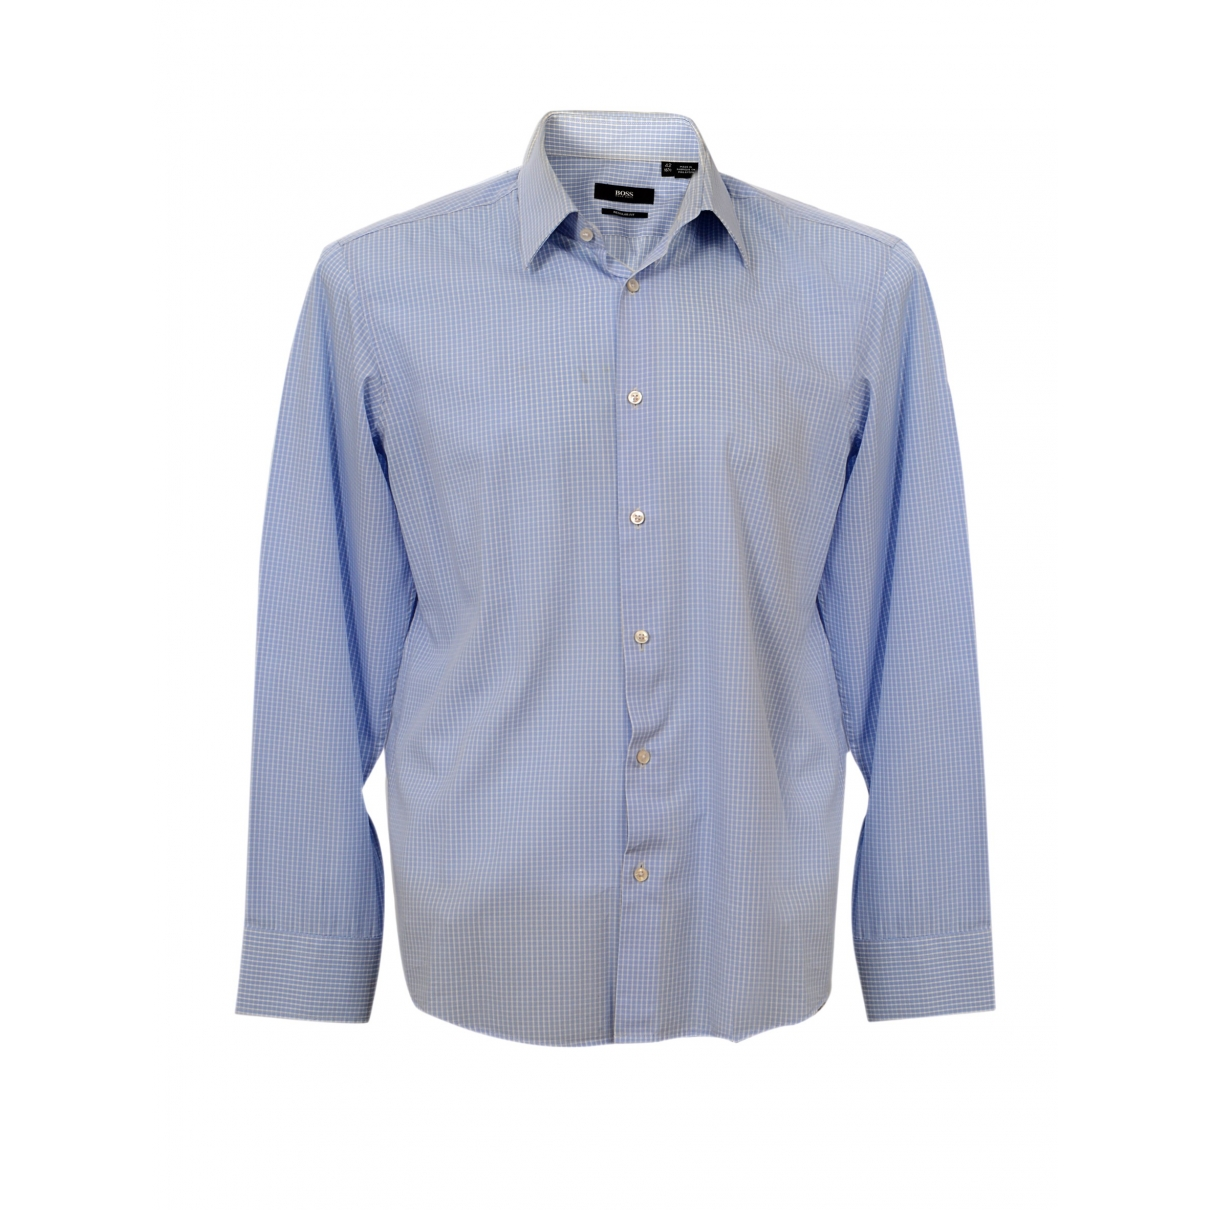 Boss \N Blue Cotton Shirts for Men 40 EU (tour de cou / collar)